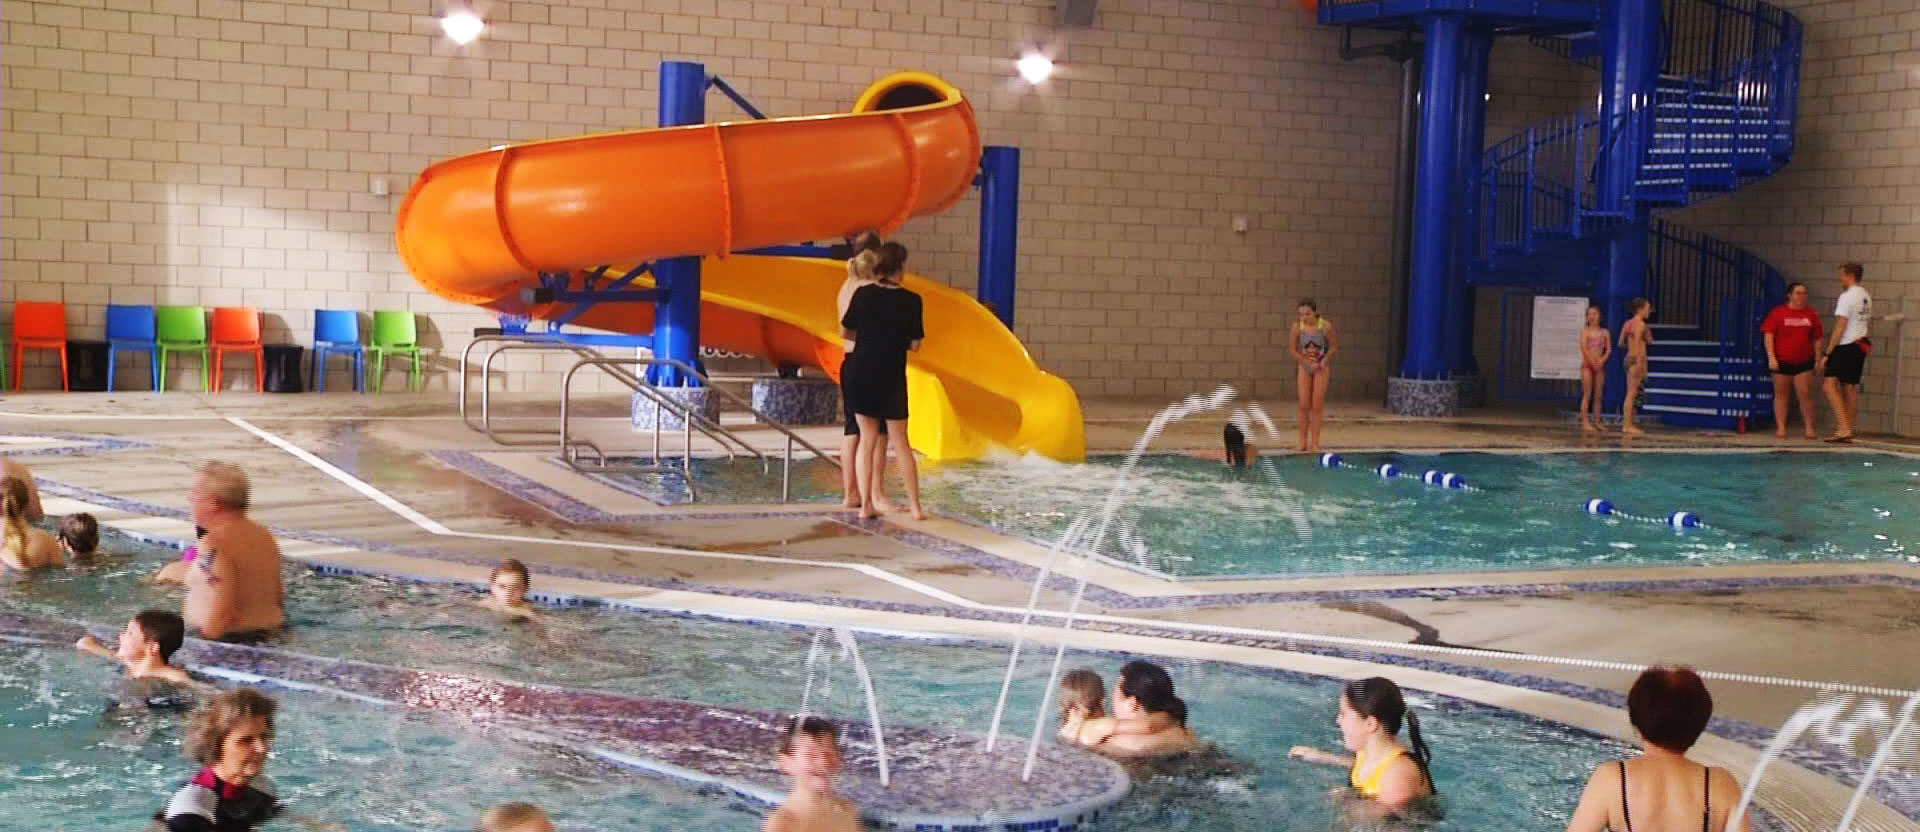 Visitors Testing Out Aquatic Center During Break